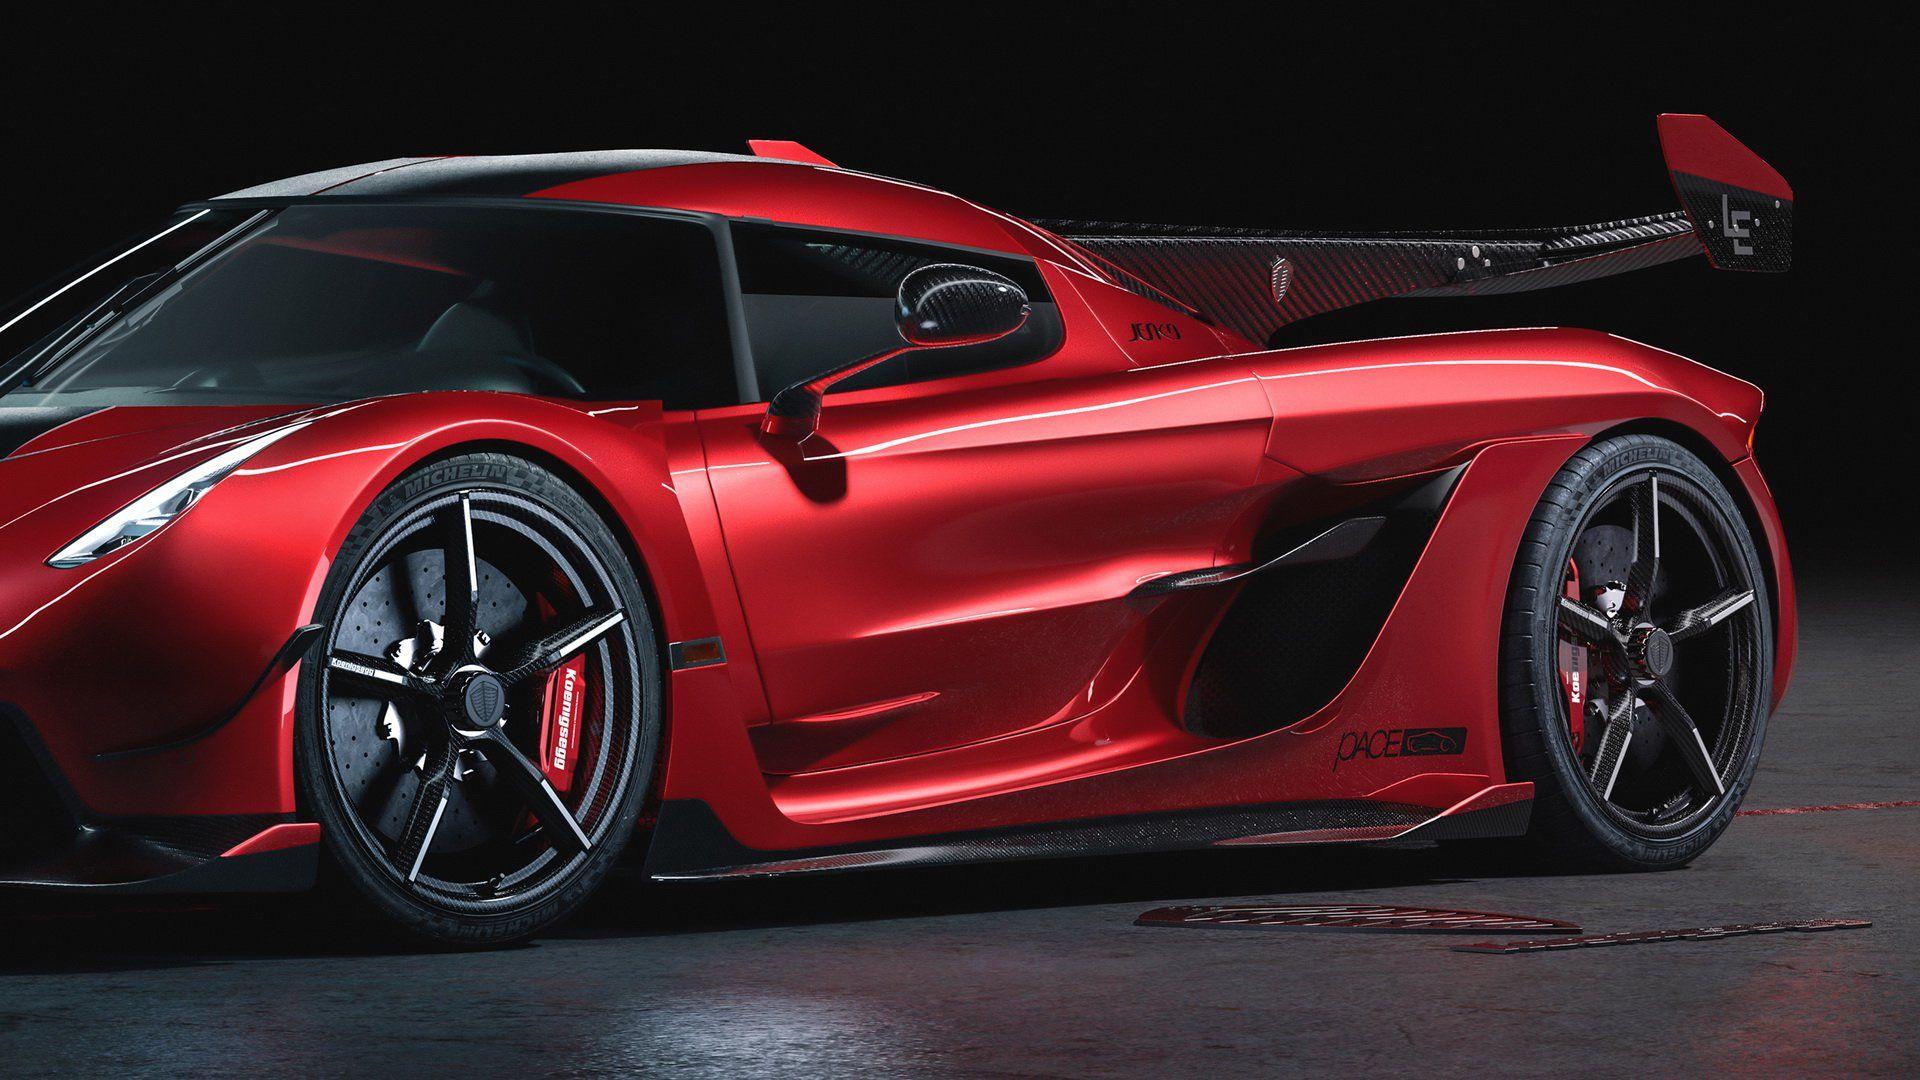 Koenigsegg Jesko Cherry Red Edition 10 Is Pure Sweetness Carscoops Koenigsegg Koenigsegg Jesko Car Design